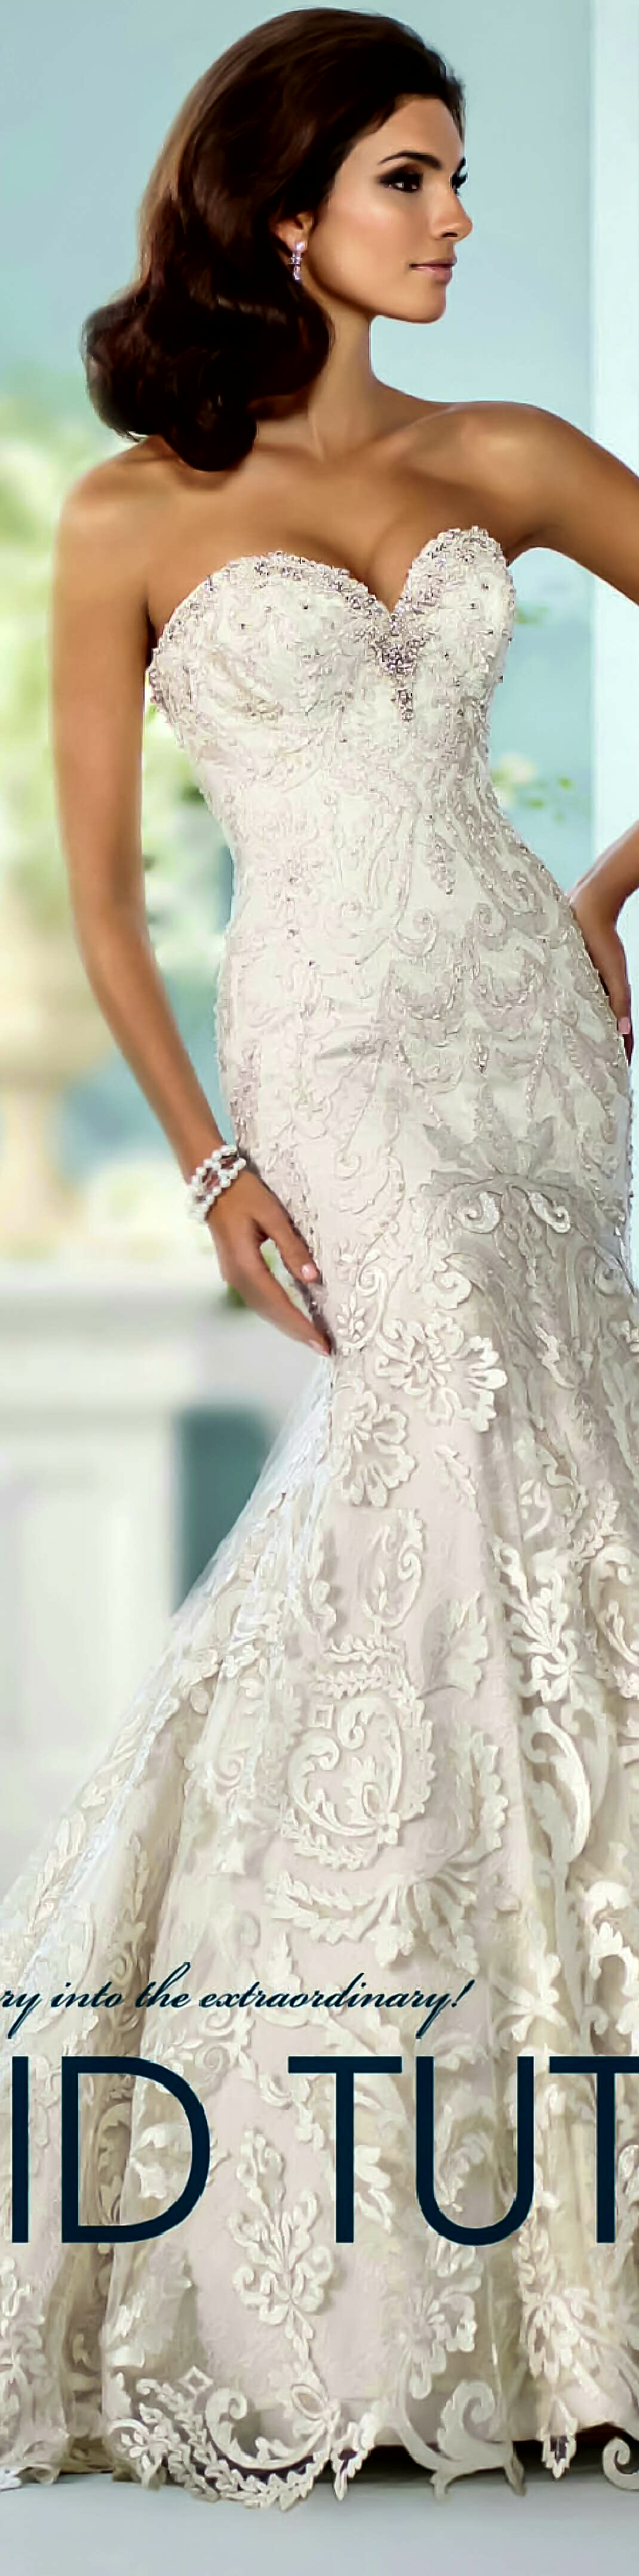 David Tutera, Bridal 2017